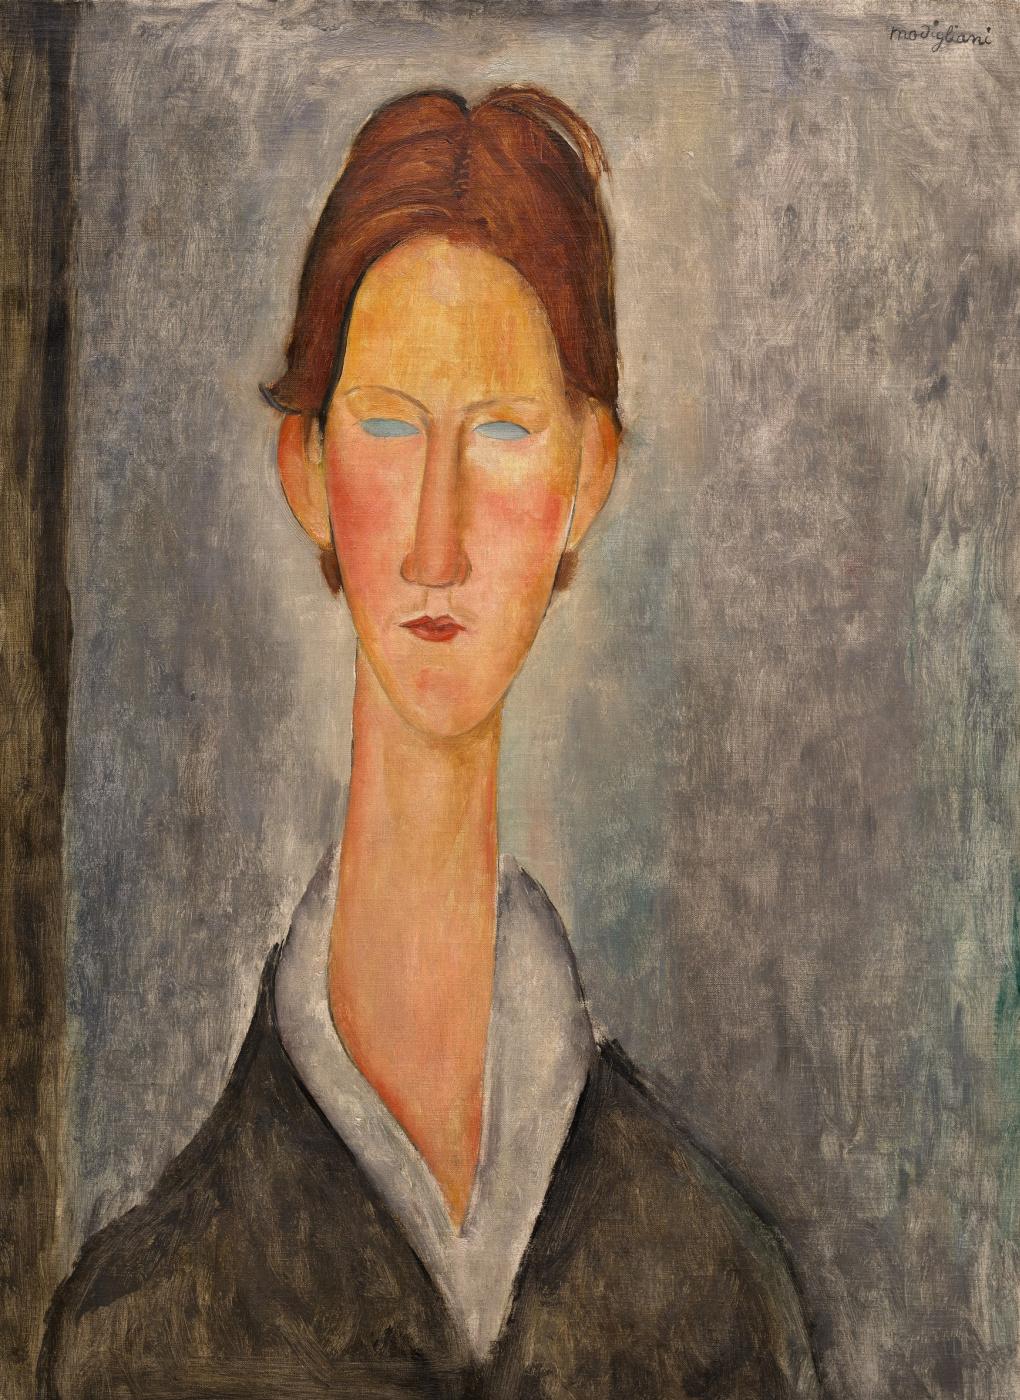 Amedeo Modigliani. Portrait of a student